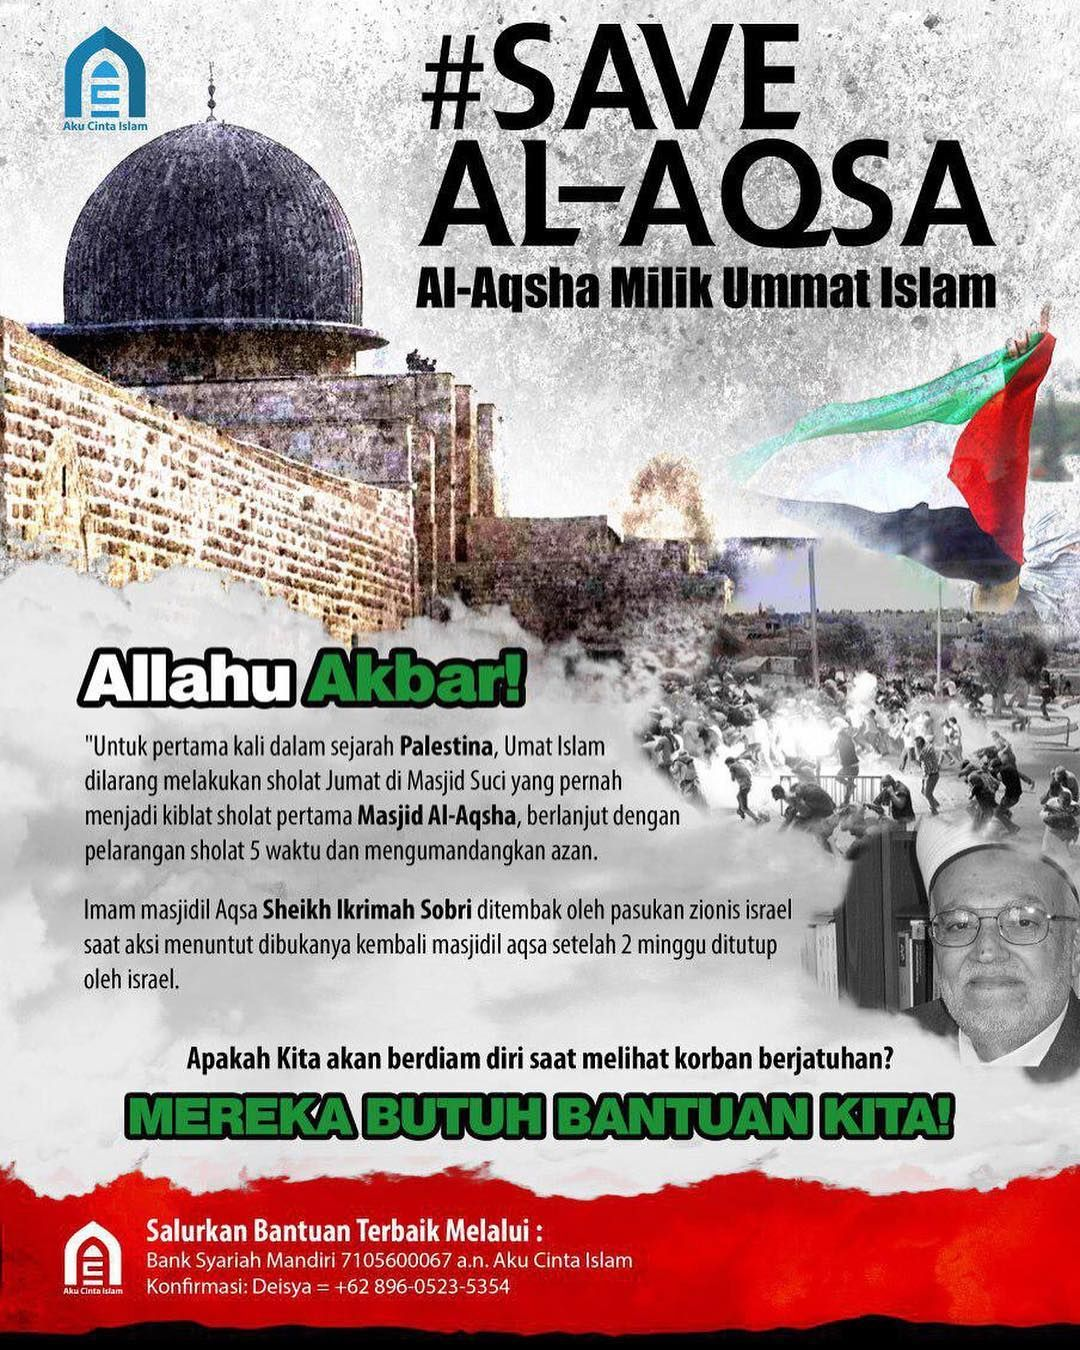 Save Al Aqsa AlAqsha Milik Ummat Islam Allahu Akbar